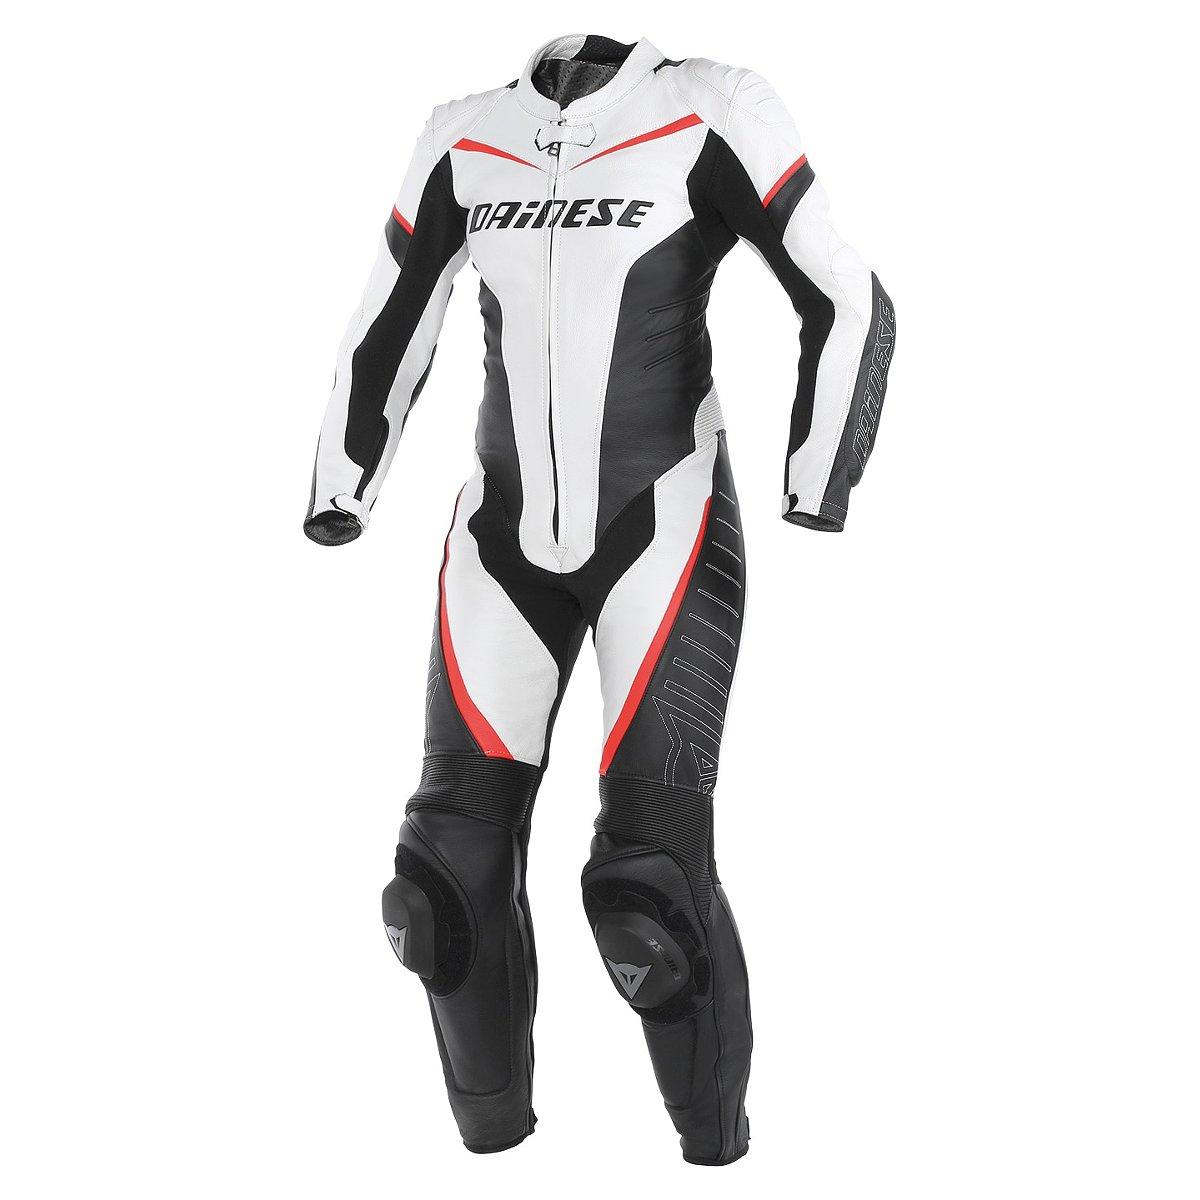 Tuta moto donna pelle Dainese Racing Bianco Nero Rosso